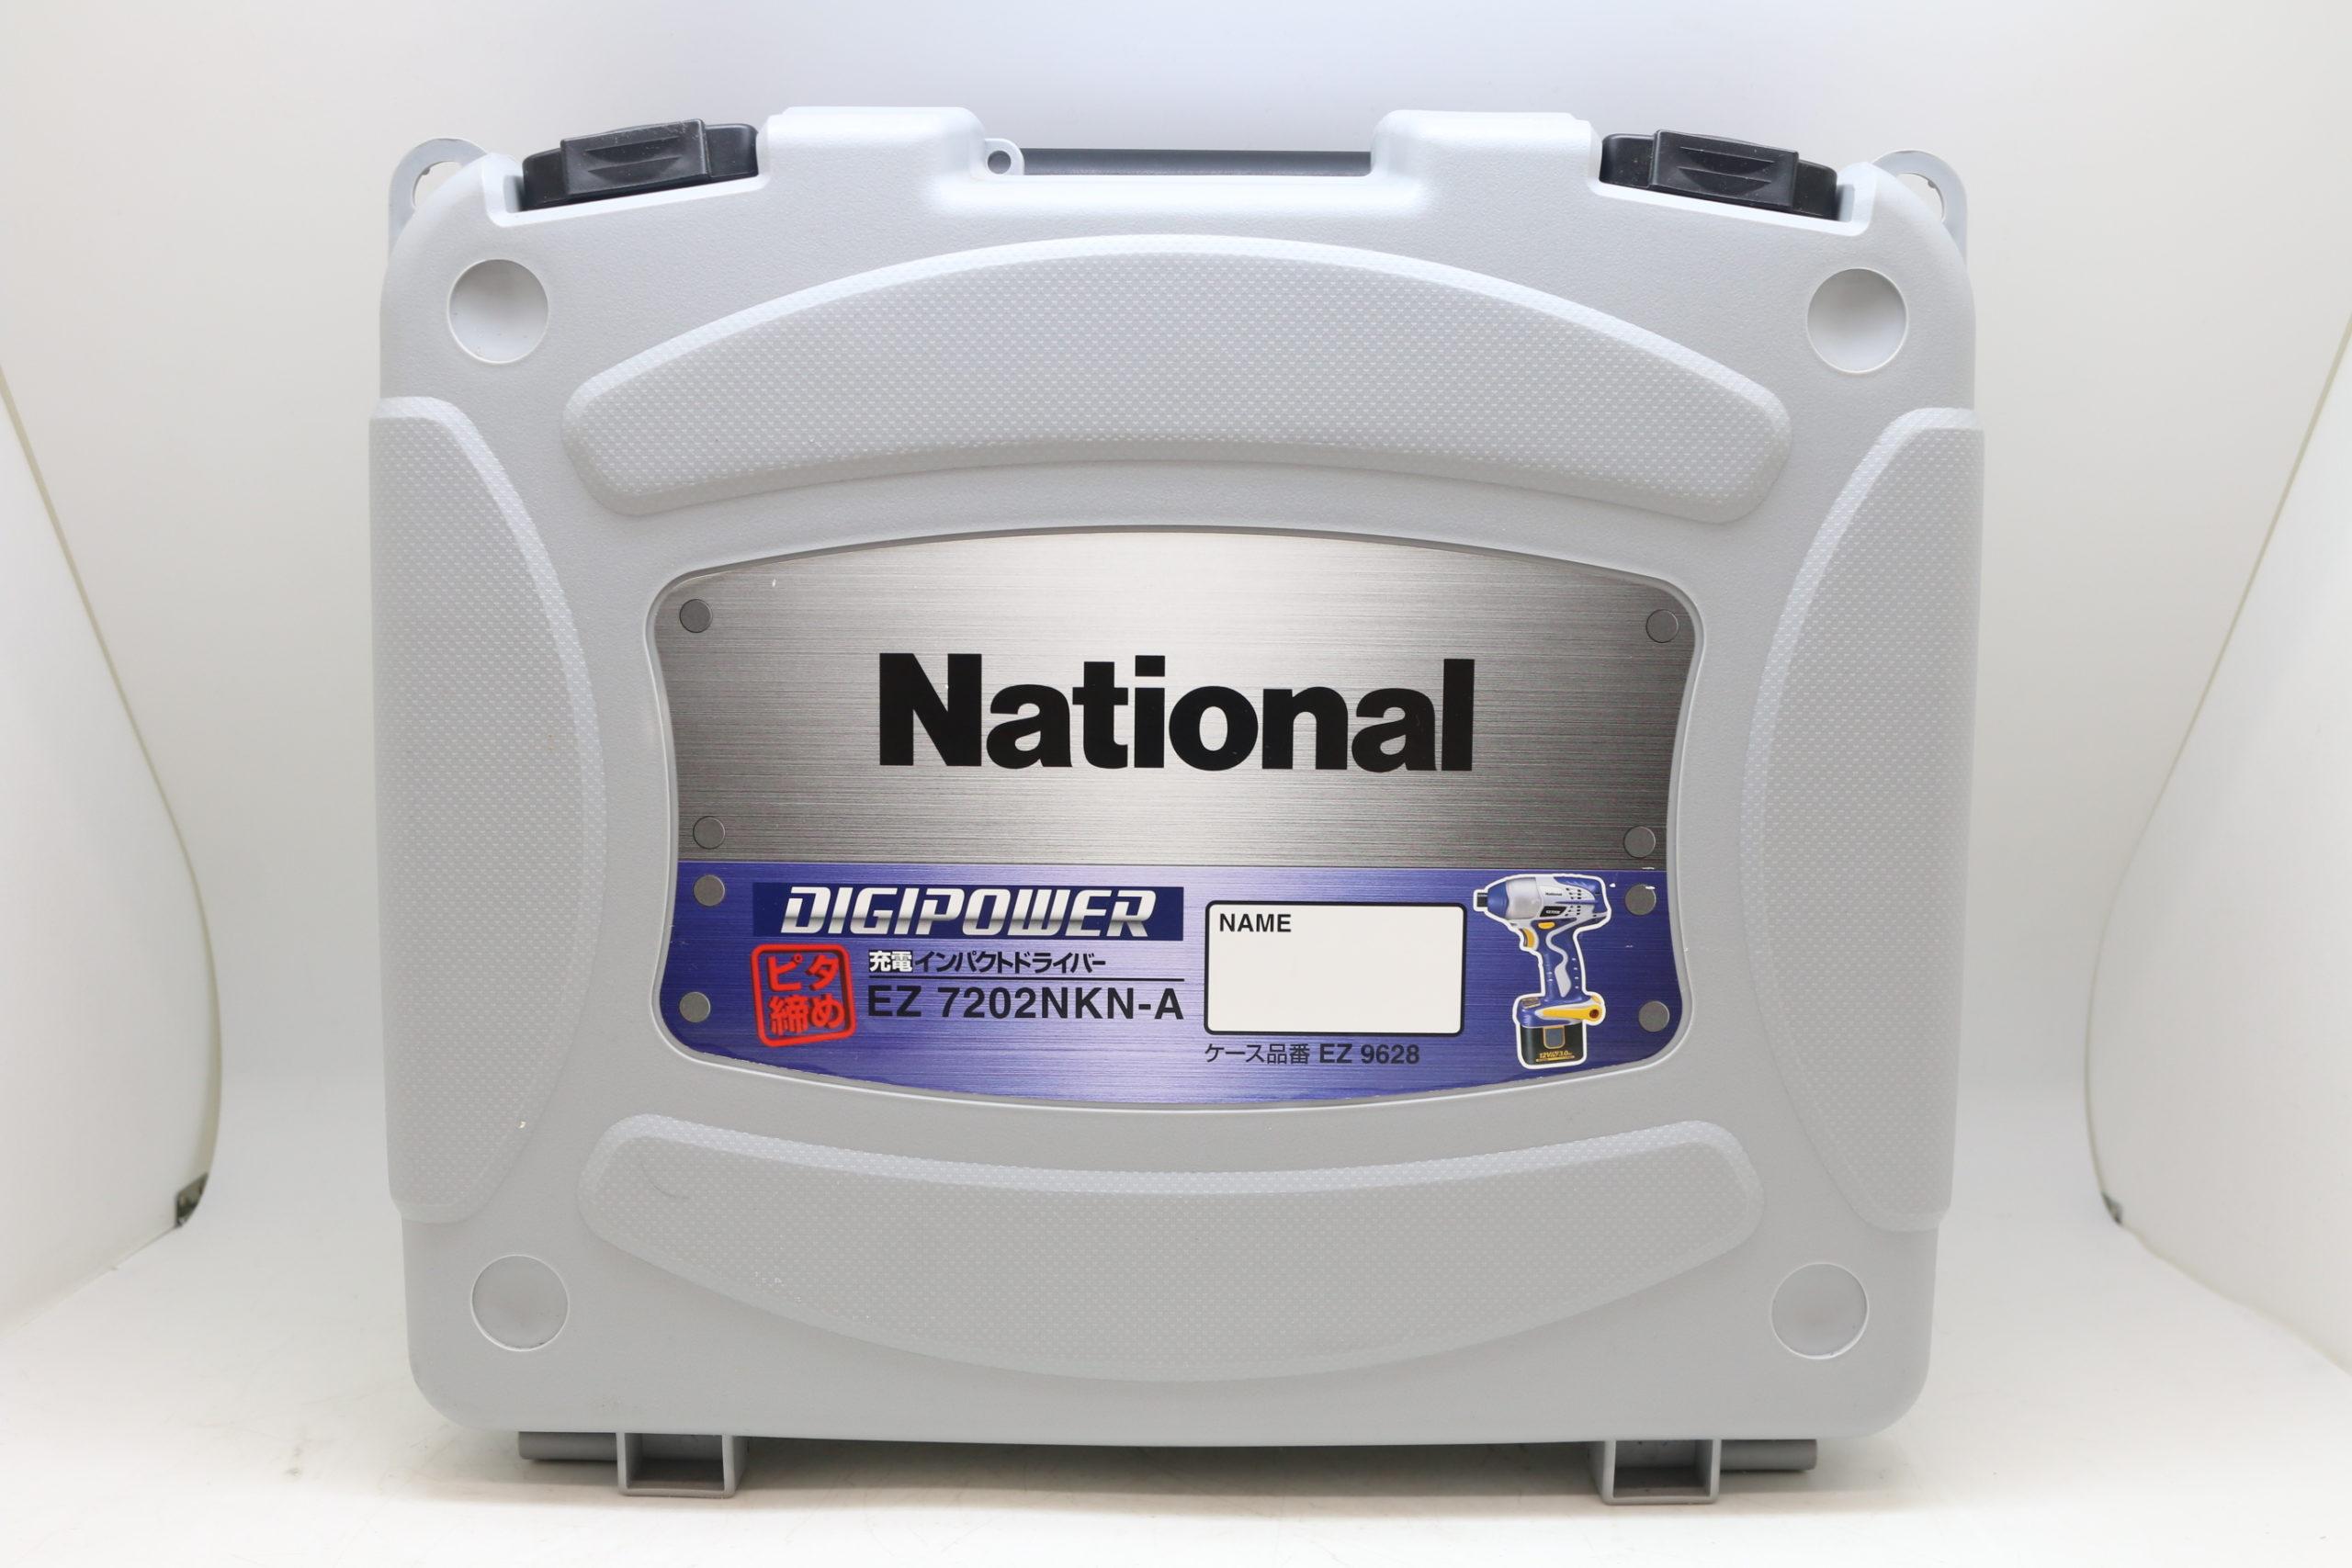 National/ナショナル 松下電工 EZ7202NKN-A ピタ締め 充電式 インパクトドライバー DC12V バッテリー2個付きを買取致しました!の買取-